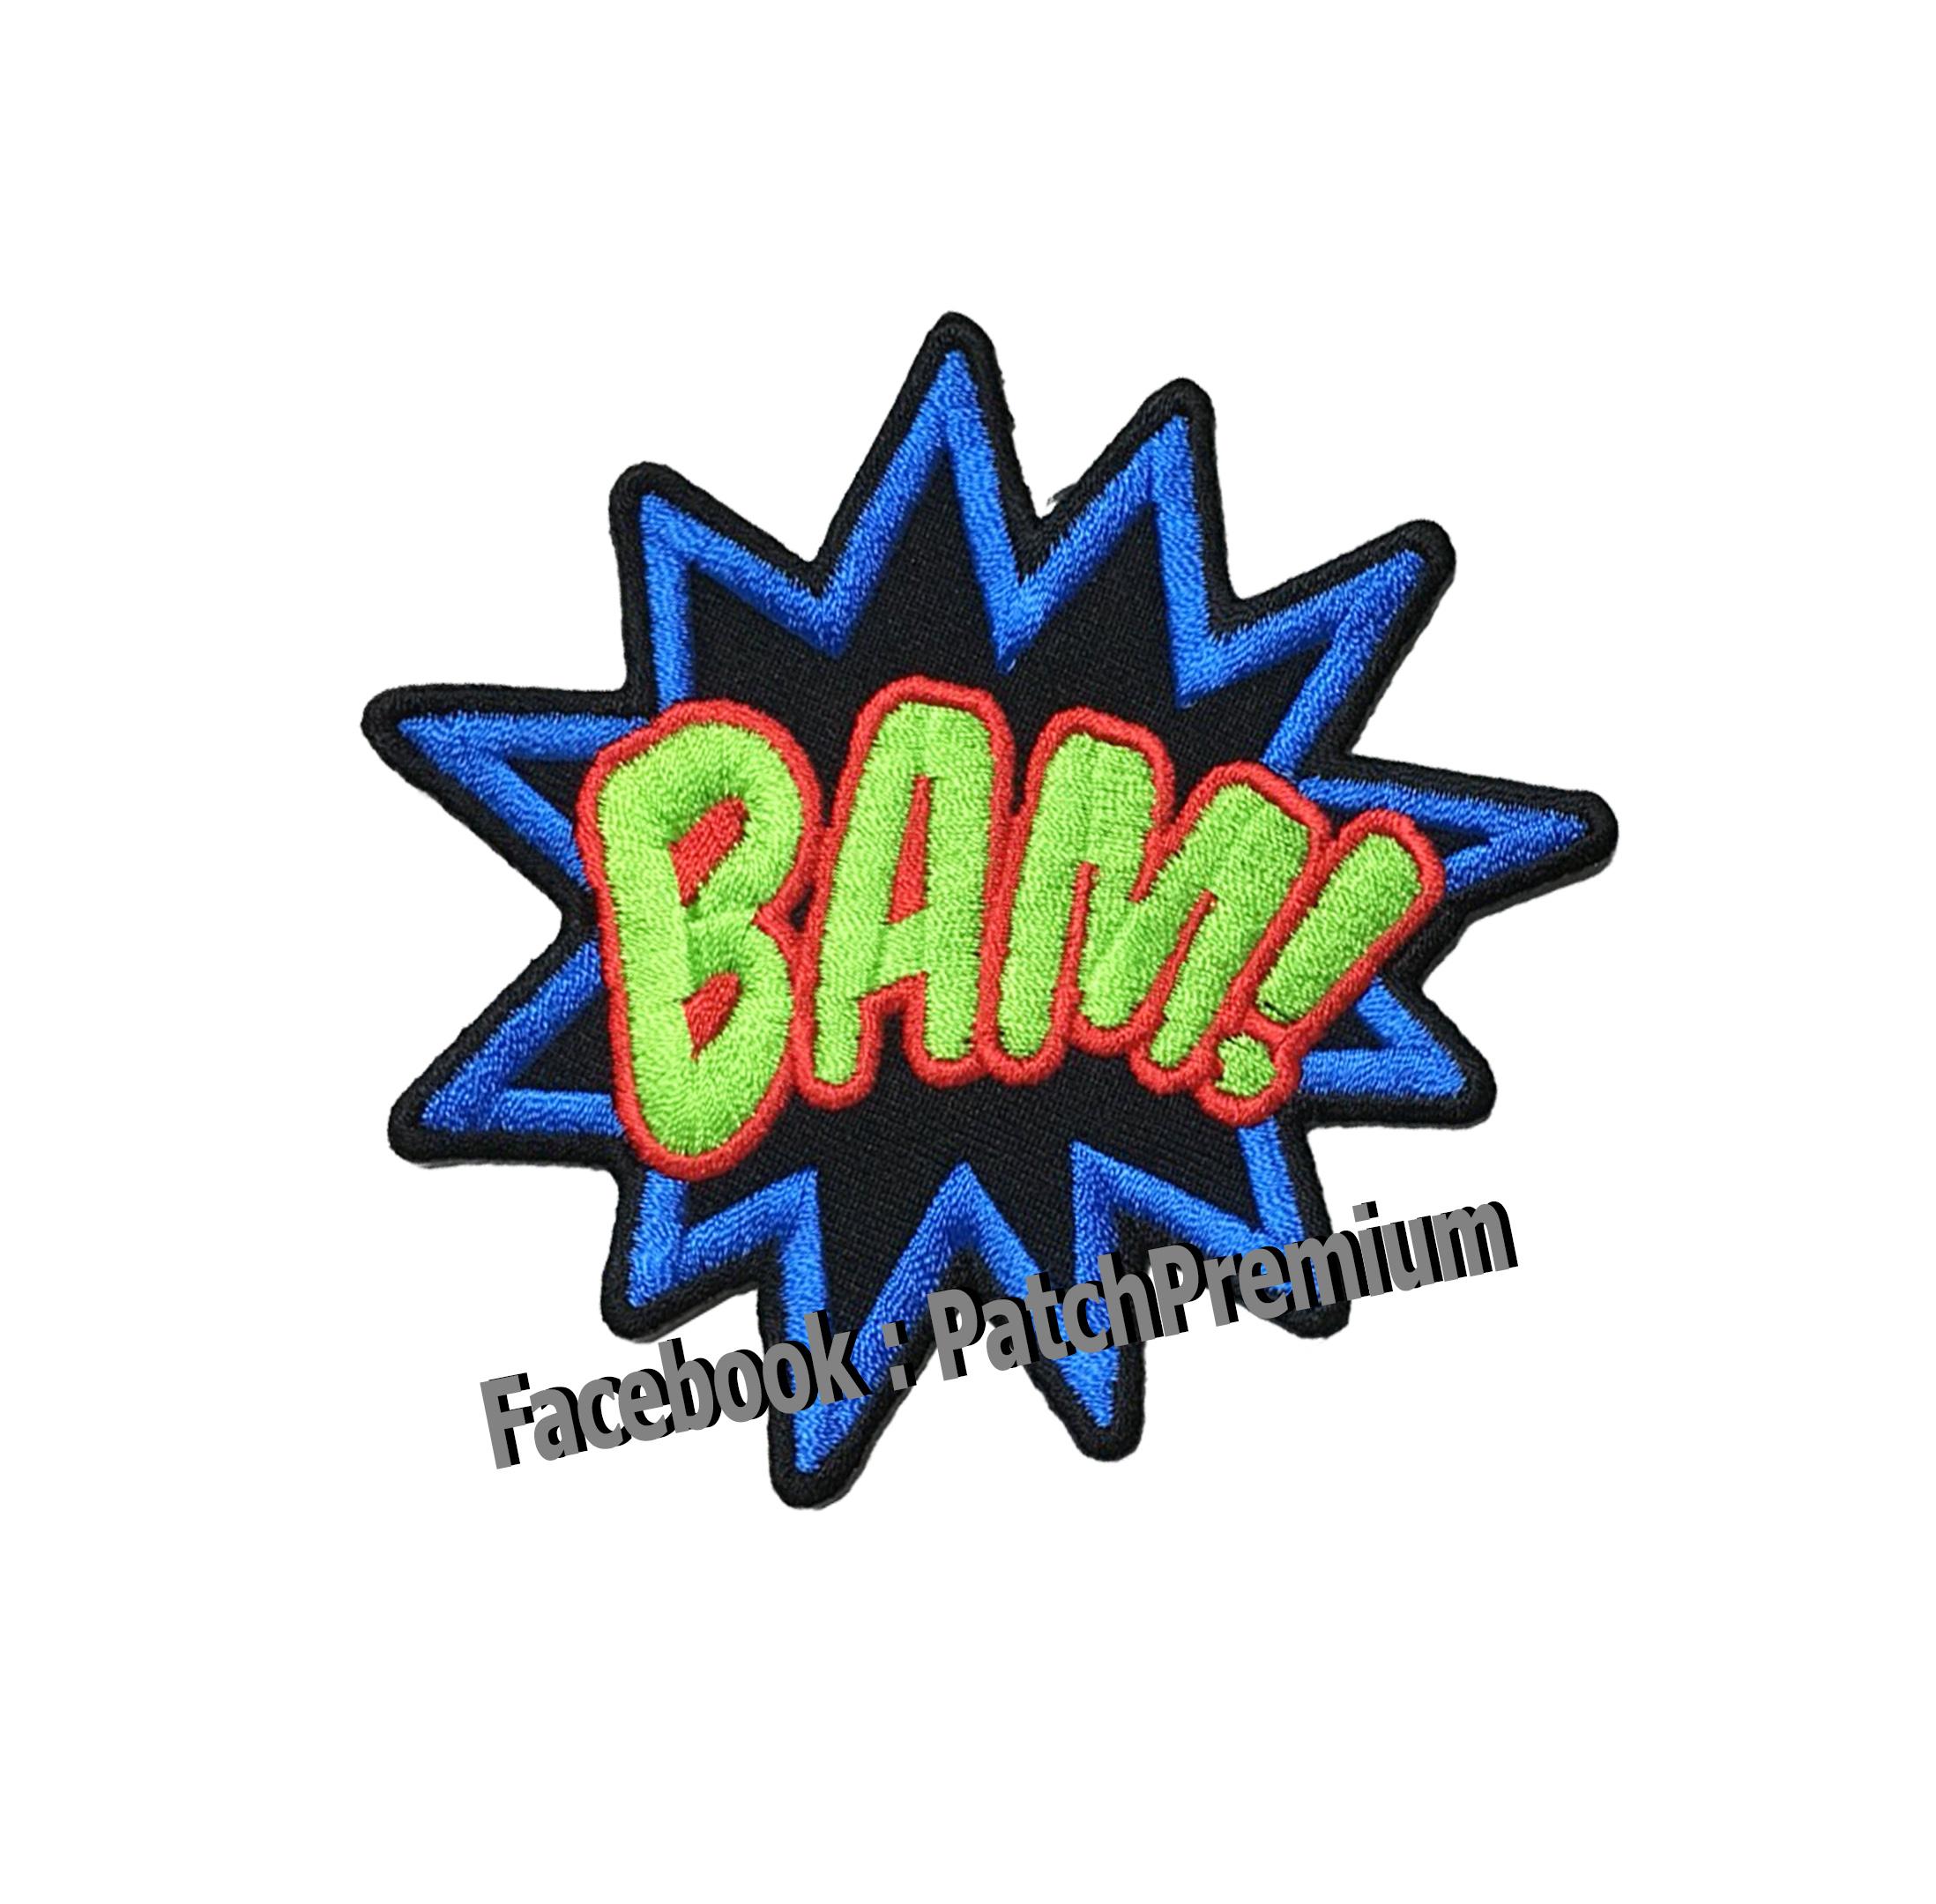 BAM! - ตัวรีด (Size M)